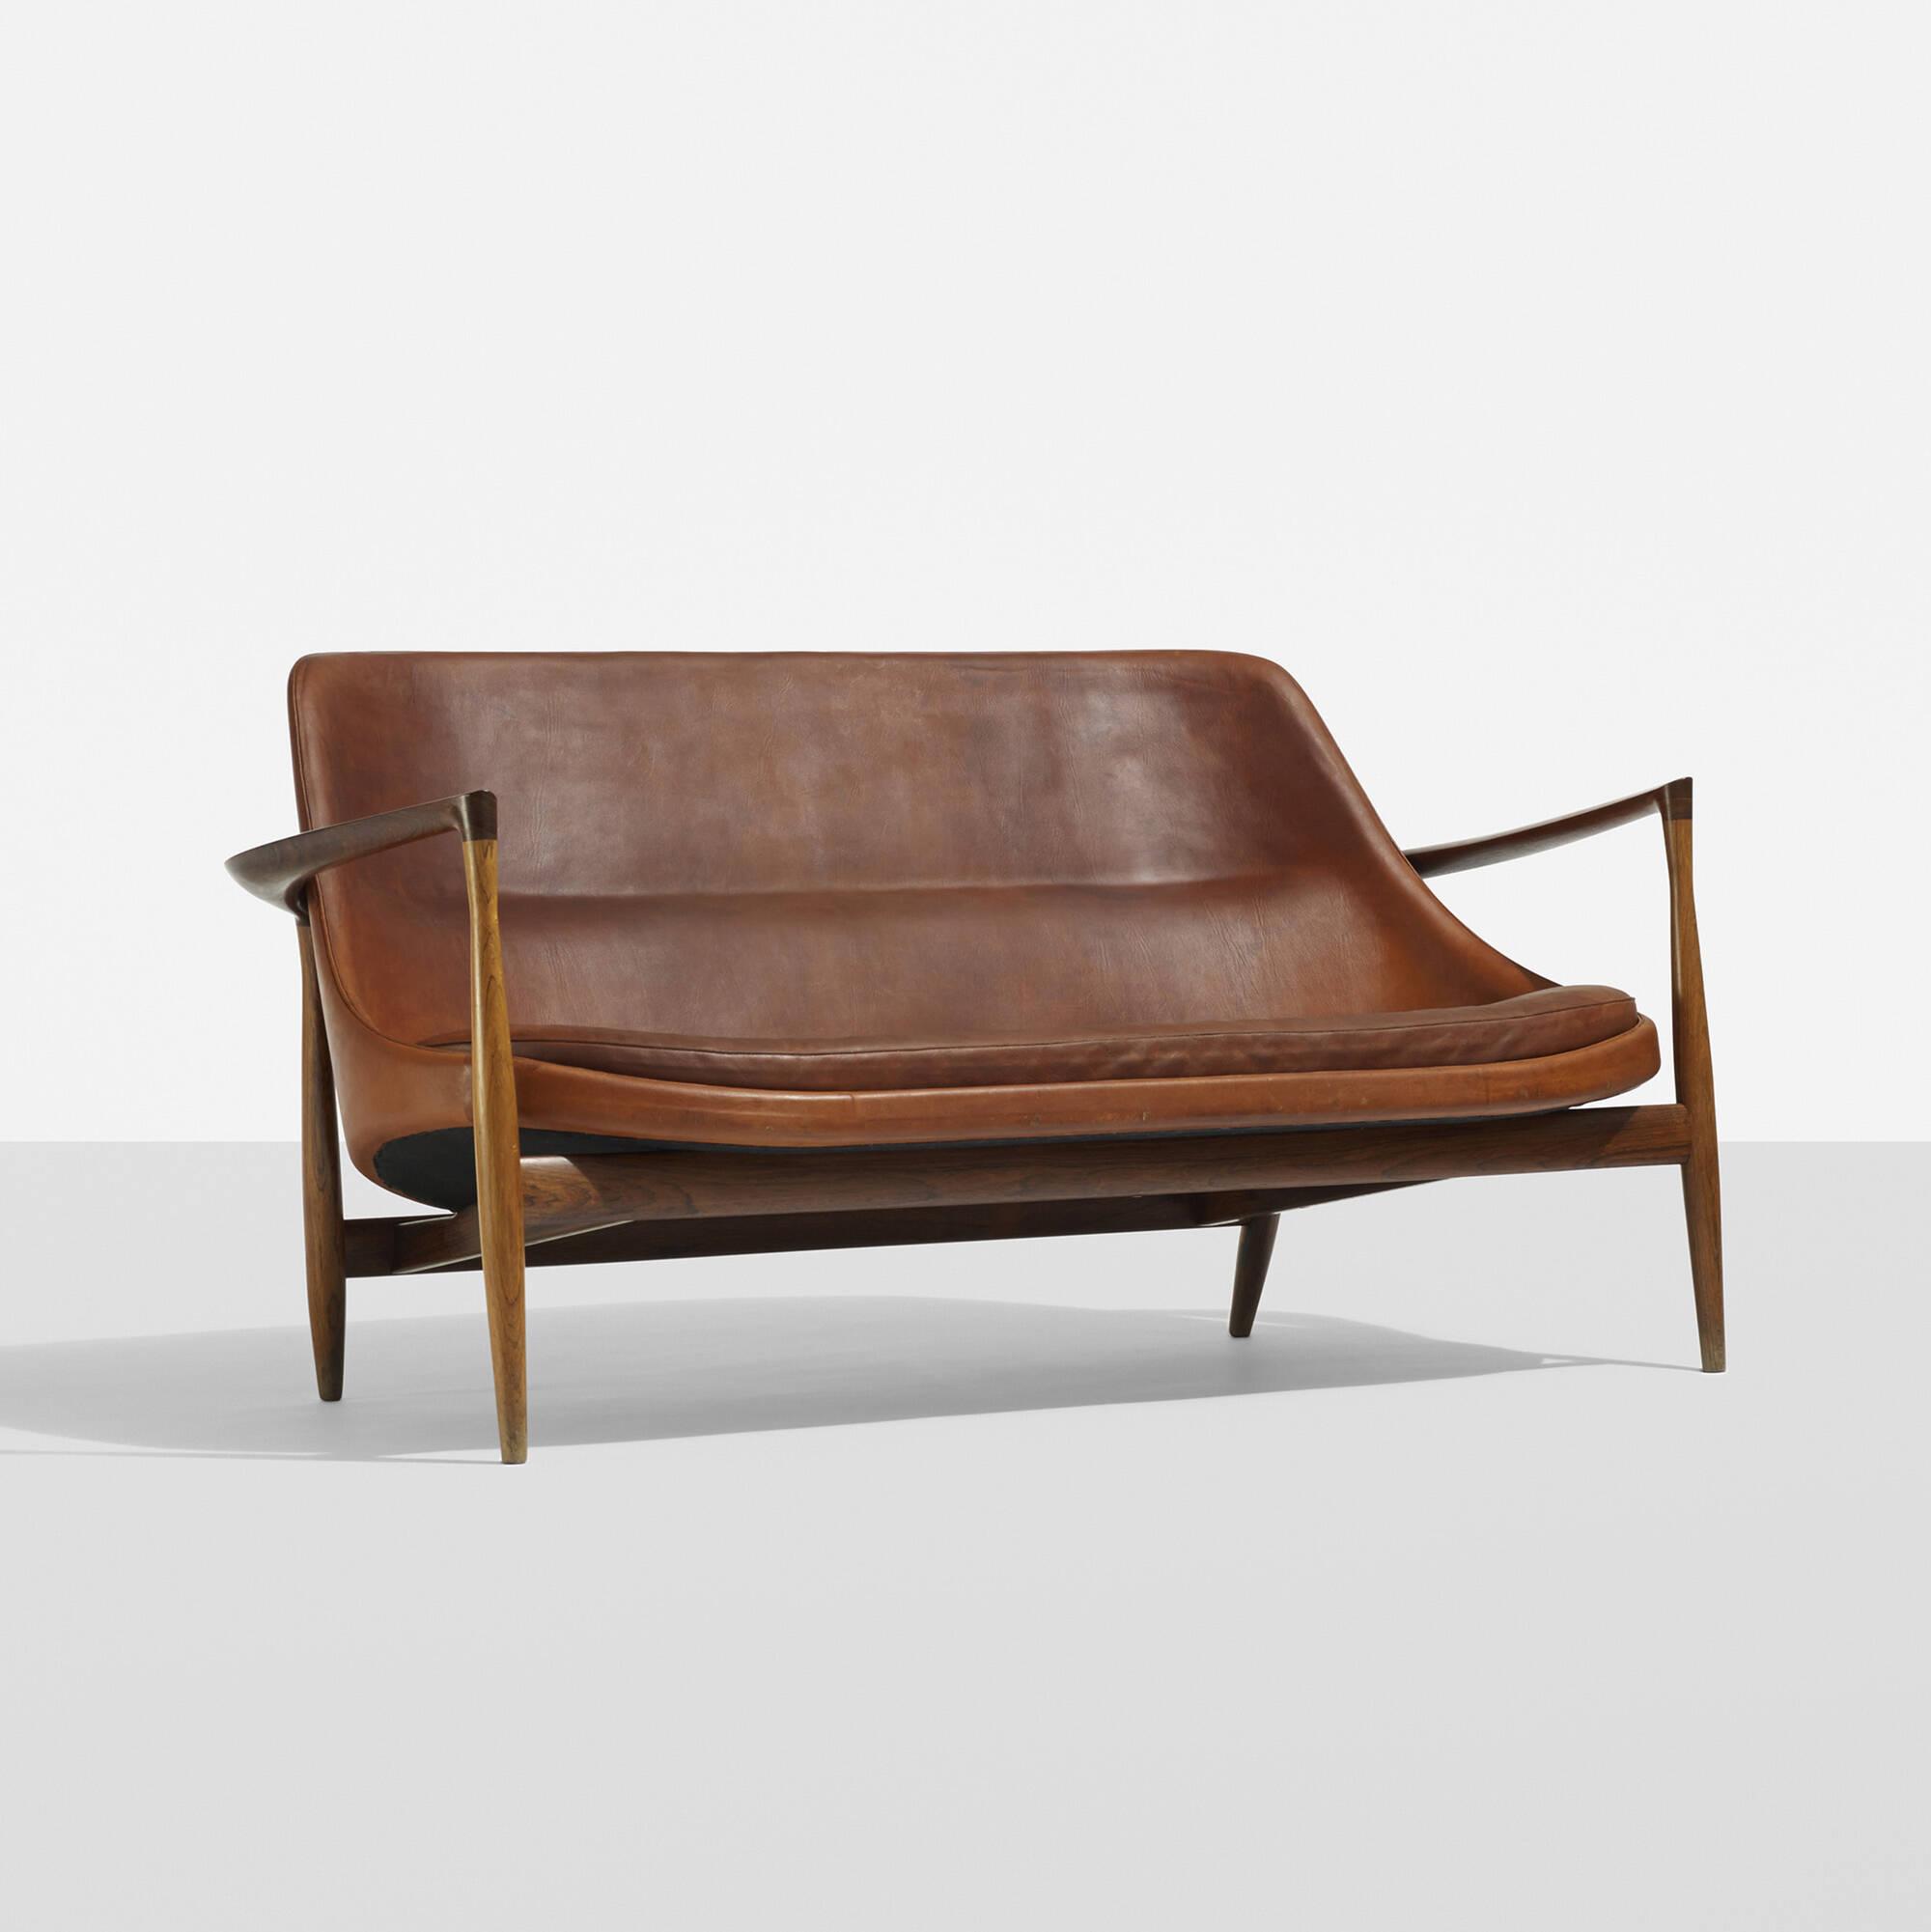 149 ib kofod larsen rare elizabeth sofa for Scandinavian design sofa bed